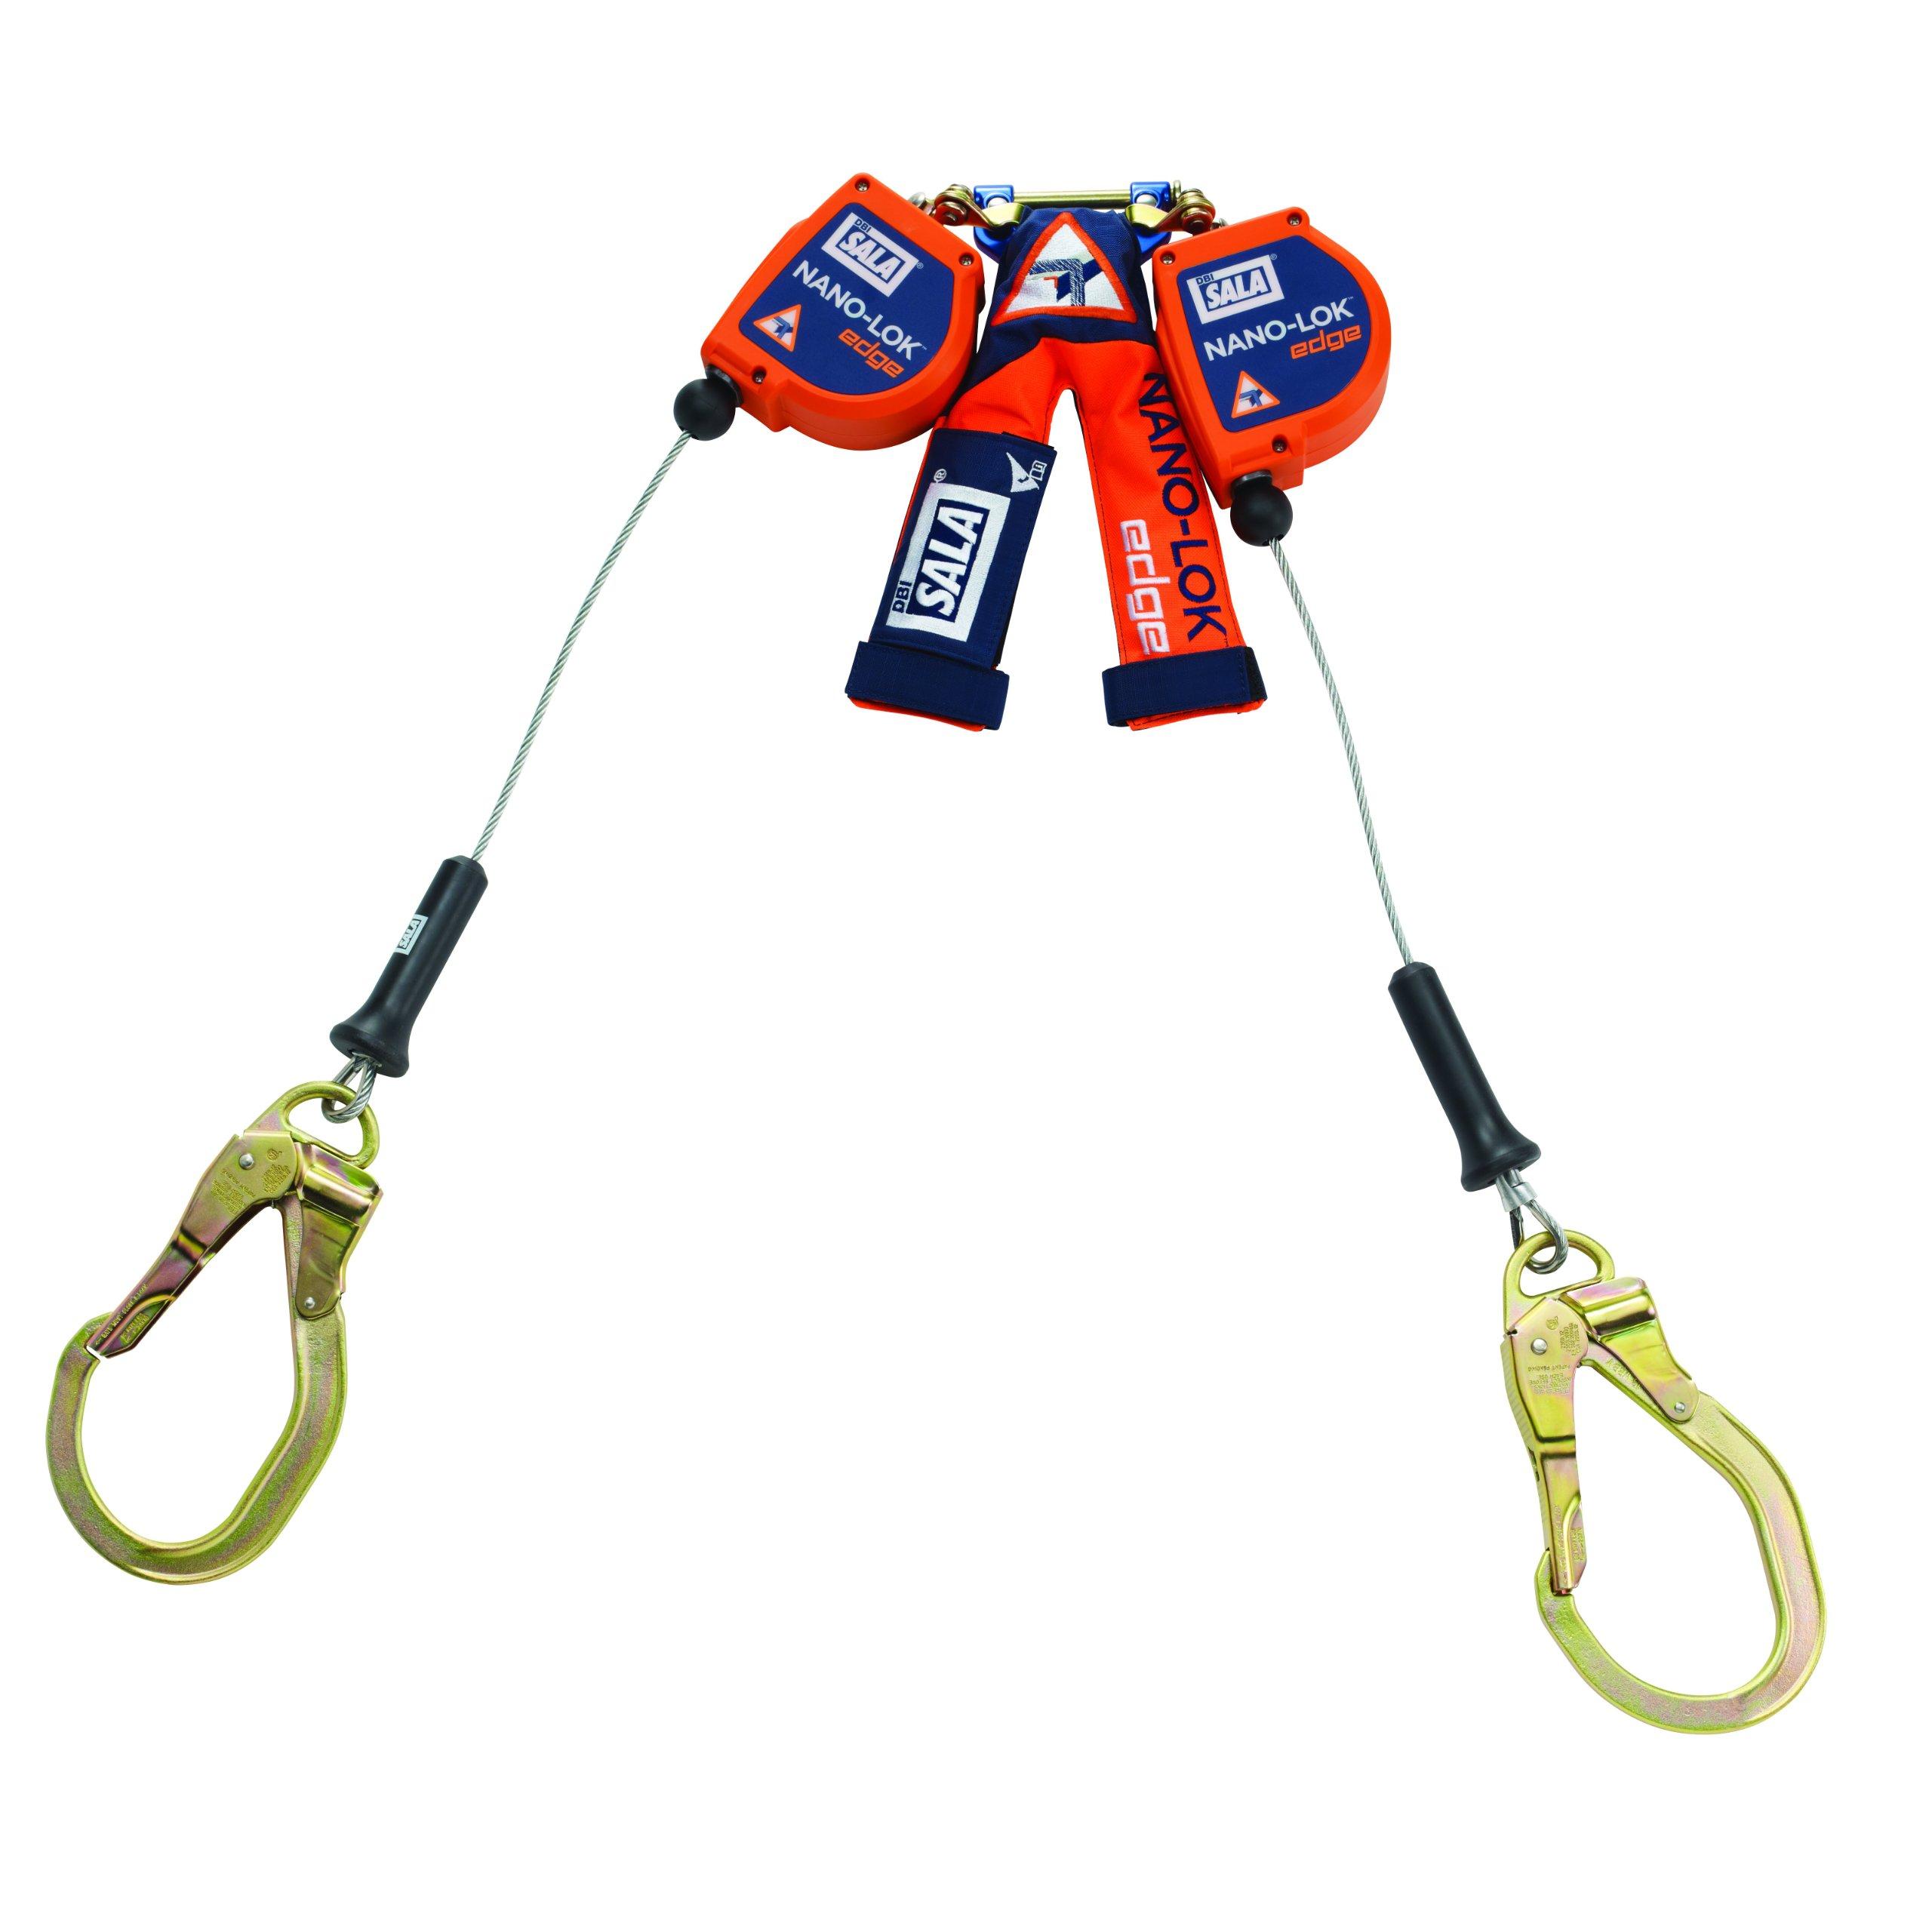 3M DBI-SALA Nano-Lok Edge 3500227 SRL, 8', Double-Leg 100 Percent Tie-Off, Leading/Sharp Edge Steel Rebar Hook, Quick Connector for Harness Mount